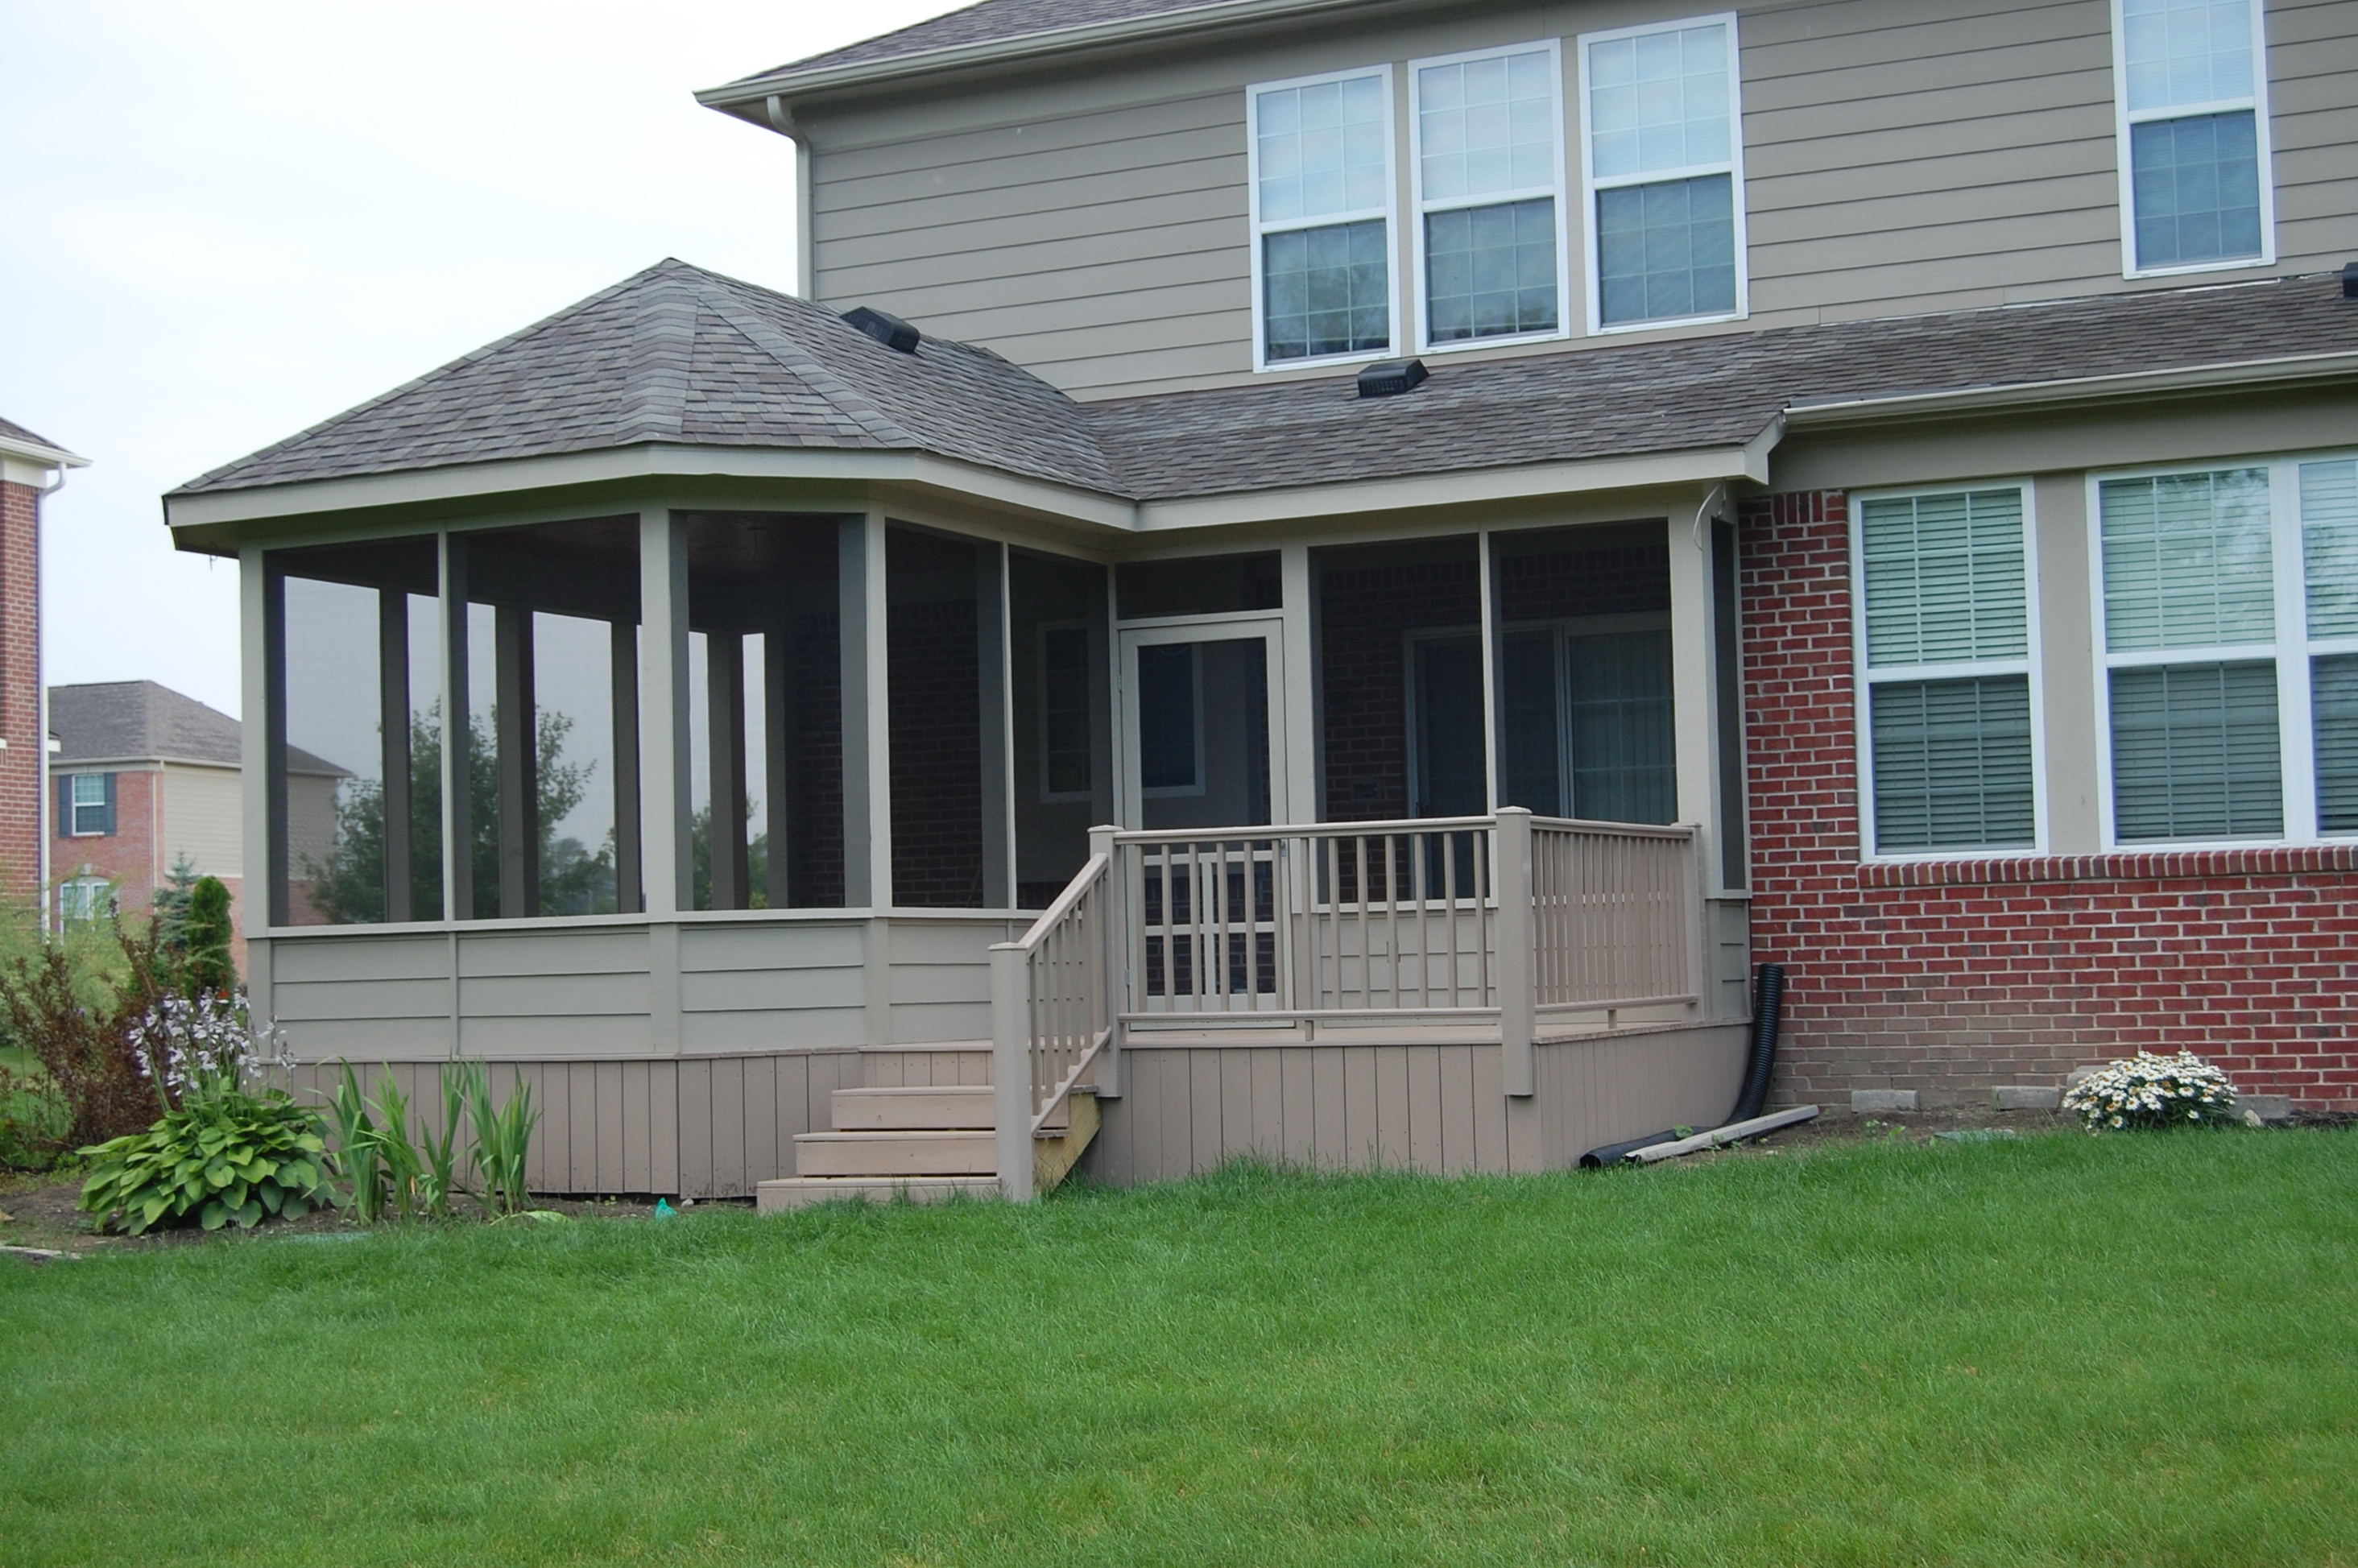 Mobile Home Front Porch Designs Home Design Ideas